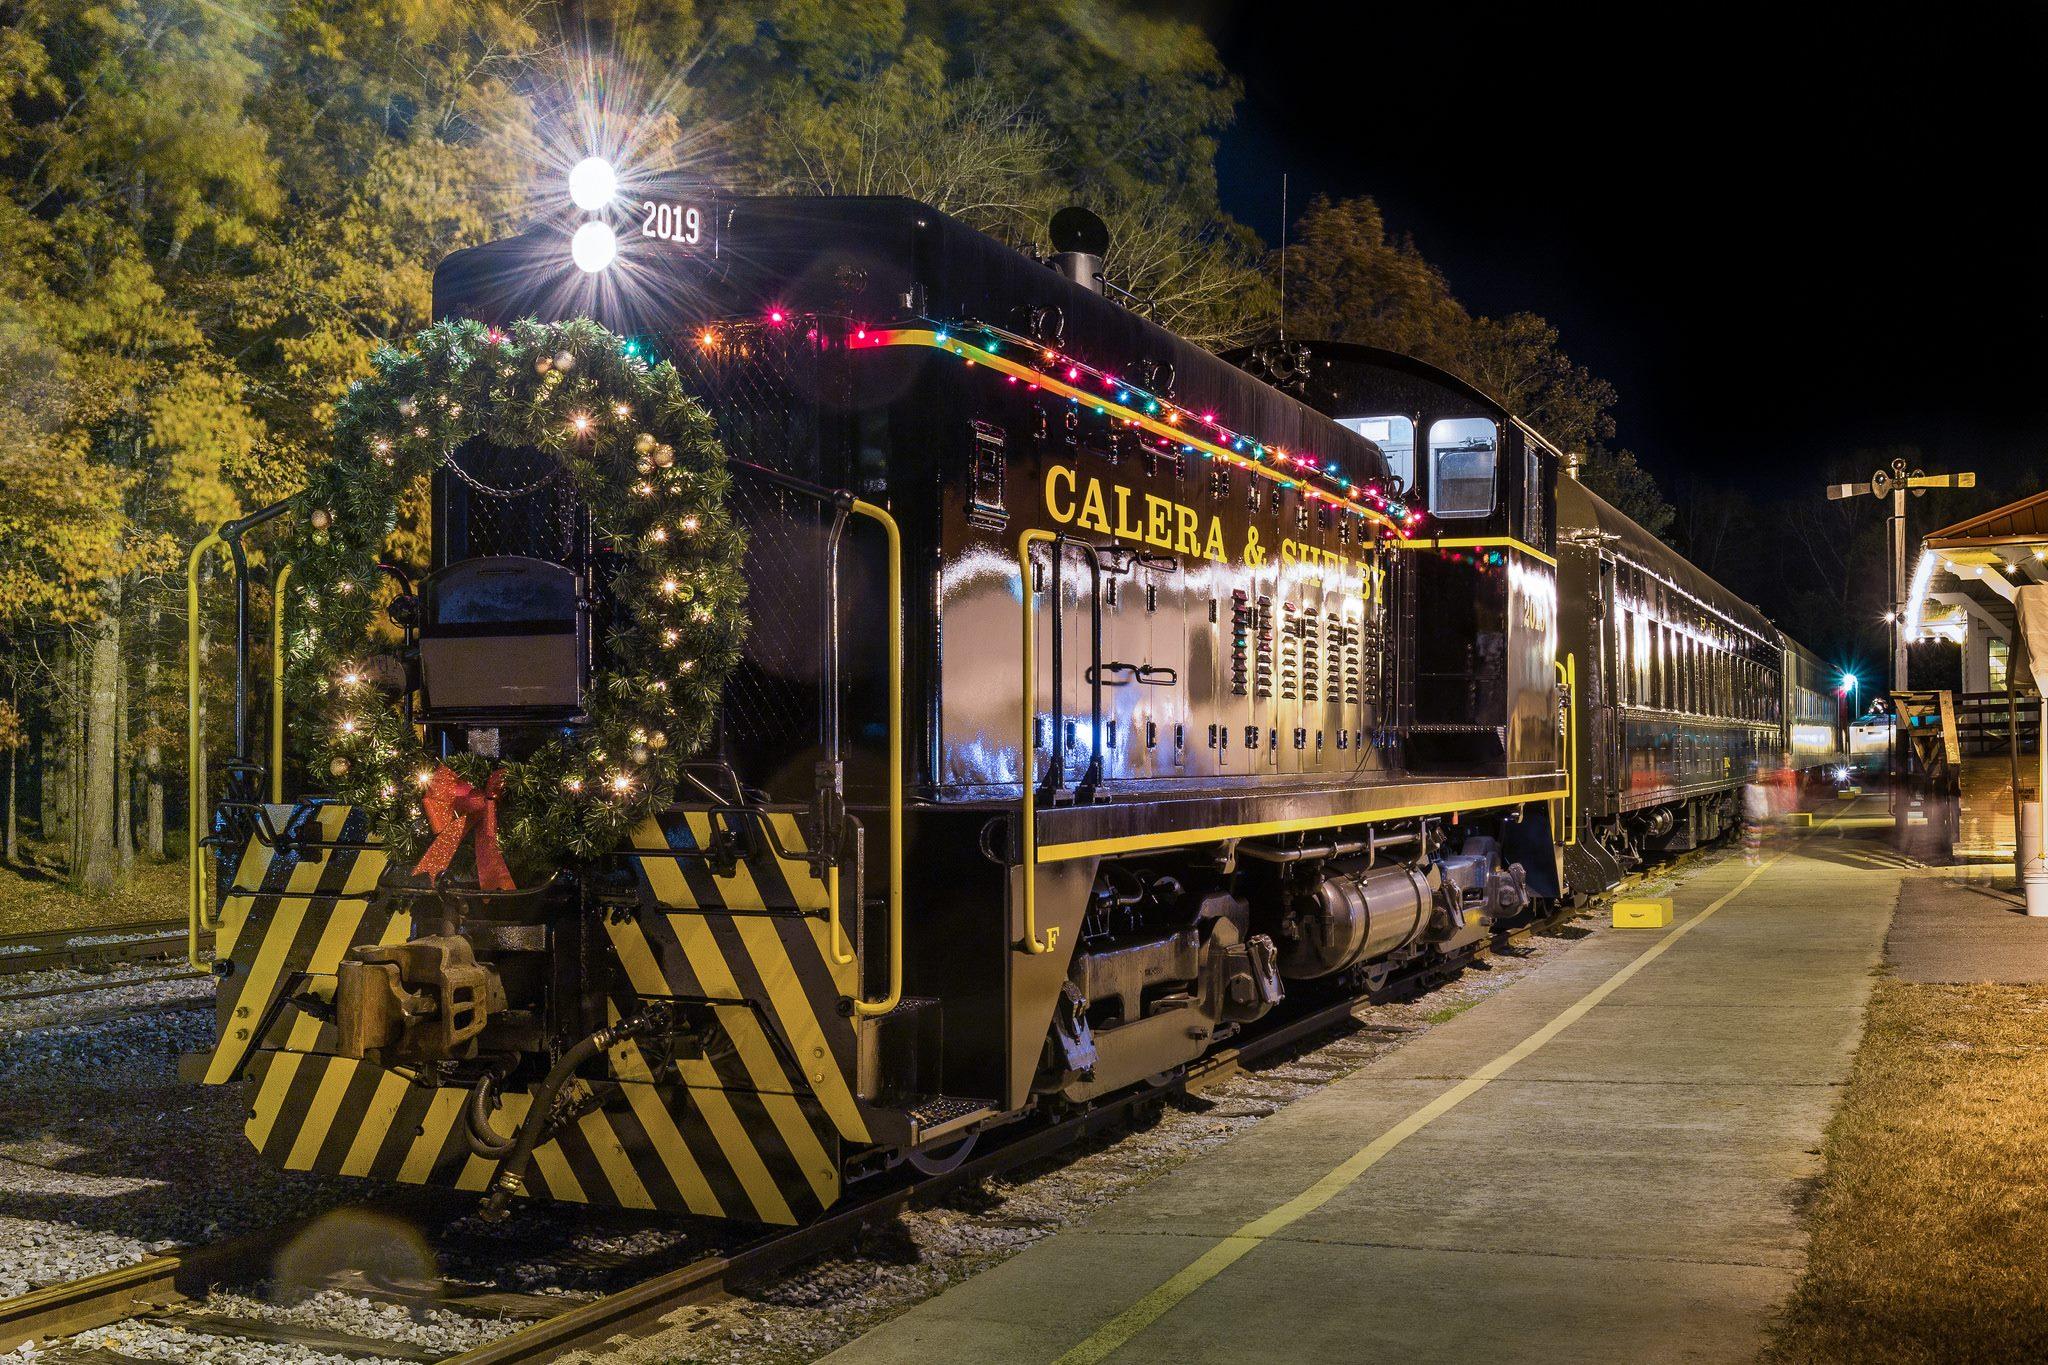 Polar express train ride in alabama heart of dixie railroad museum